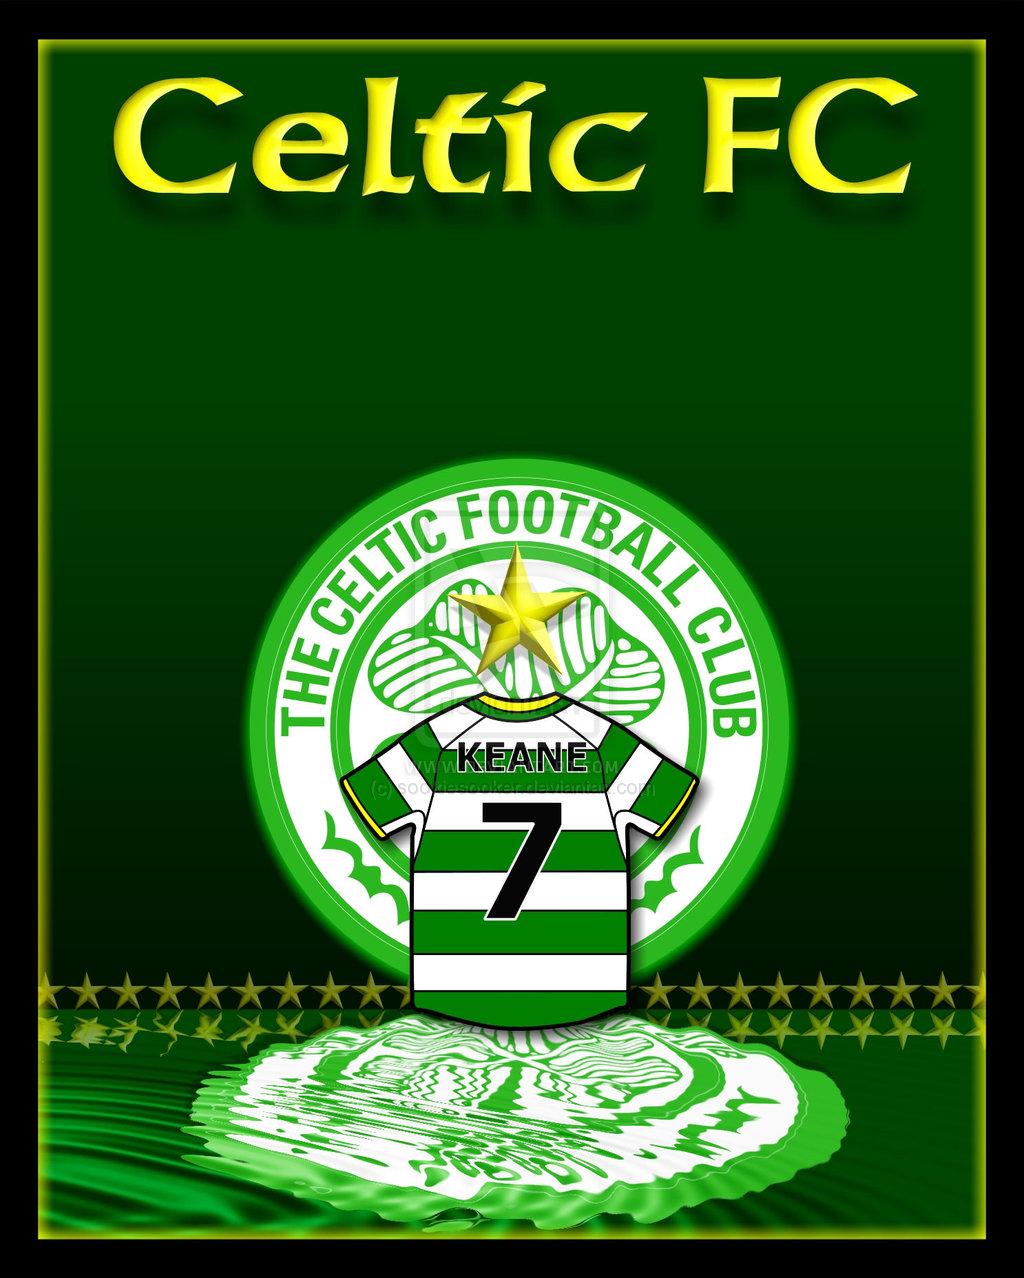 Keane Celtic FC by Sookie by sookiesooker 1024x1278